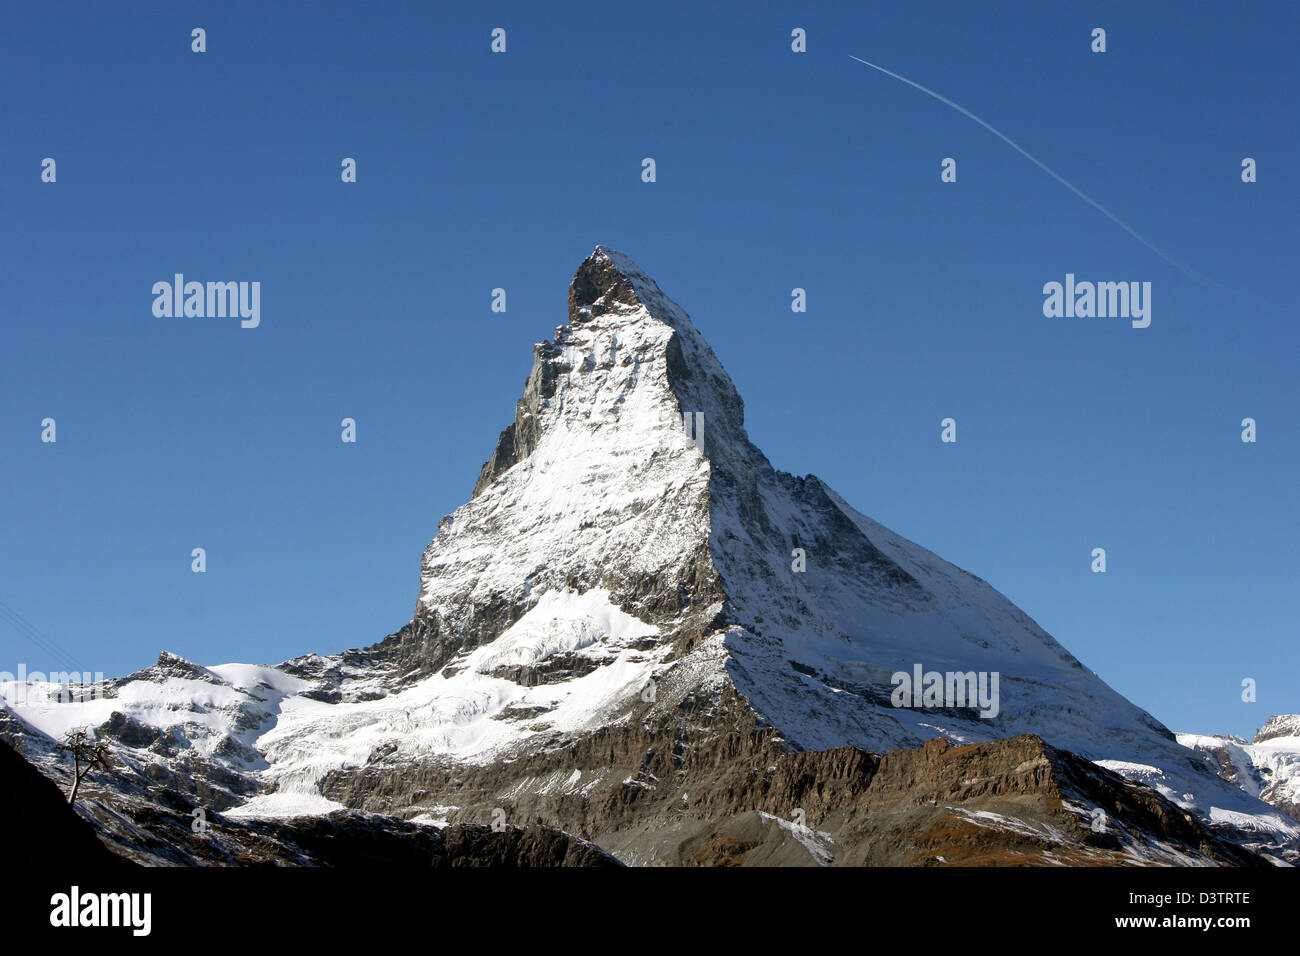 The photo shows the snow covered summit of the Matterhorn mountain above Zermatt in the Swisss canton Wallis, Switzerland, Stock Photo